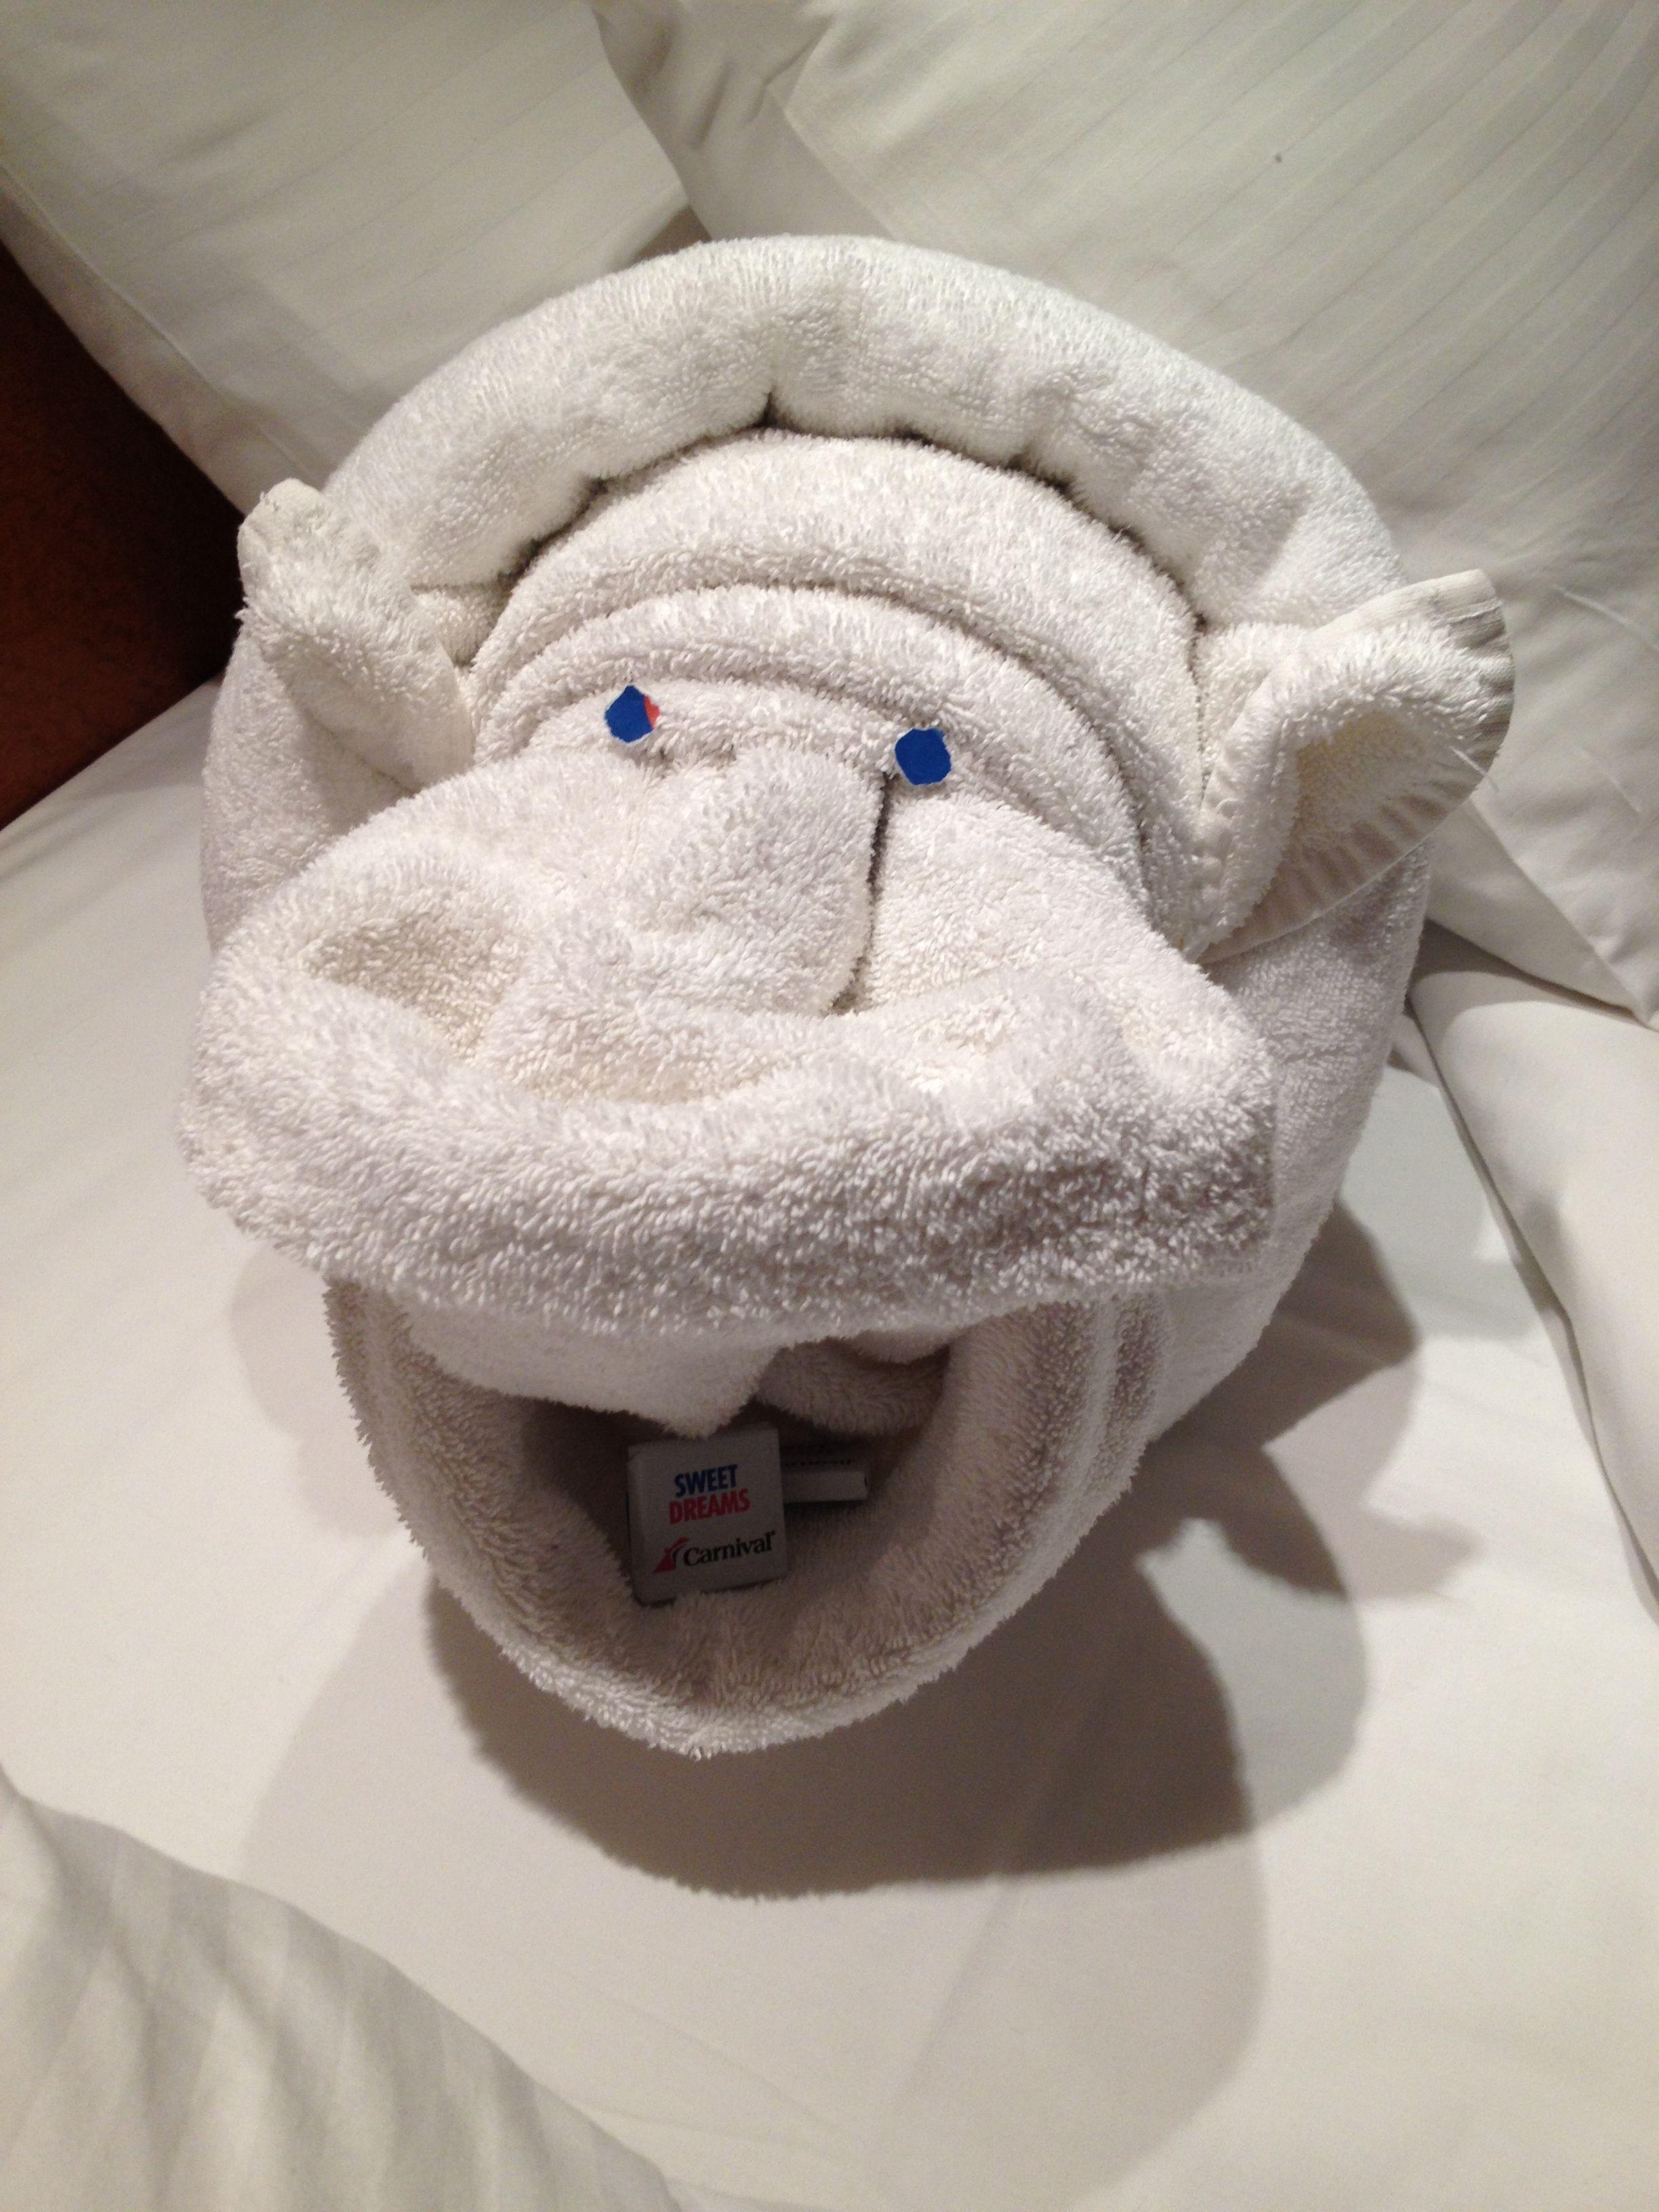 animales de la toalla animales de la selva lneas de cruceros del carnaval doblar servilletas tortas de paales fold towels towel origami